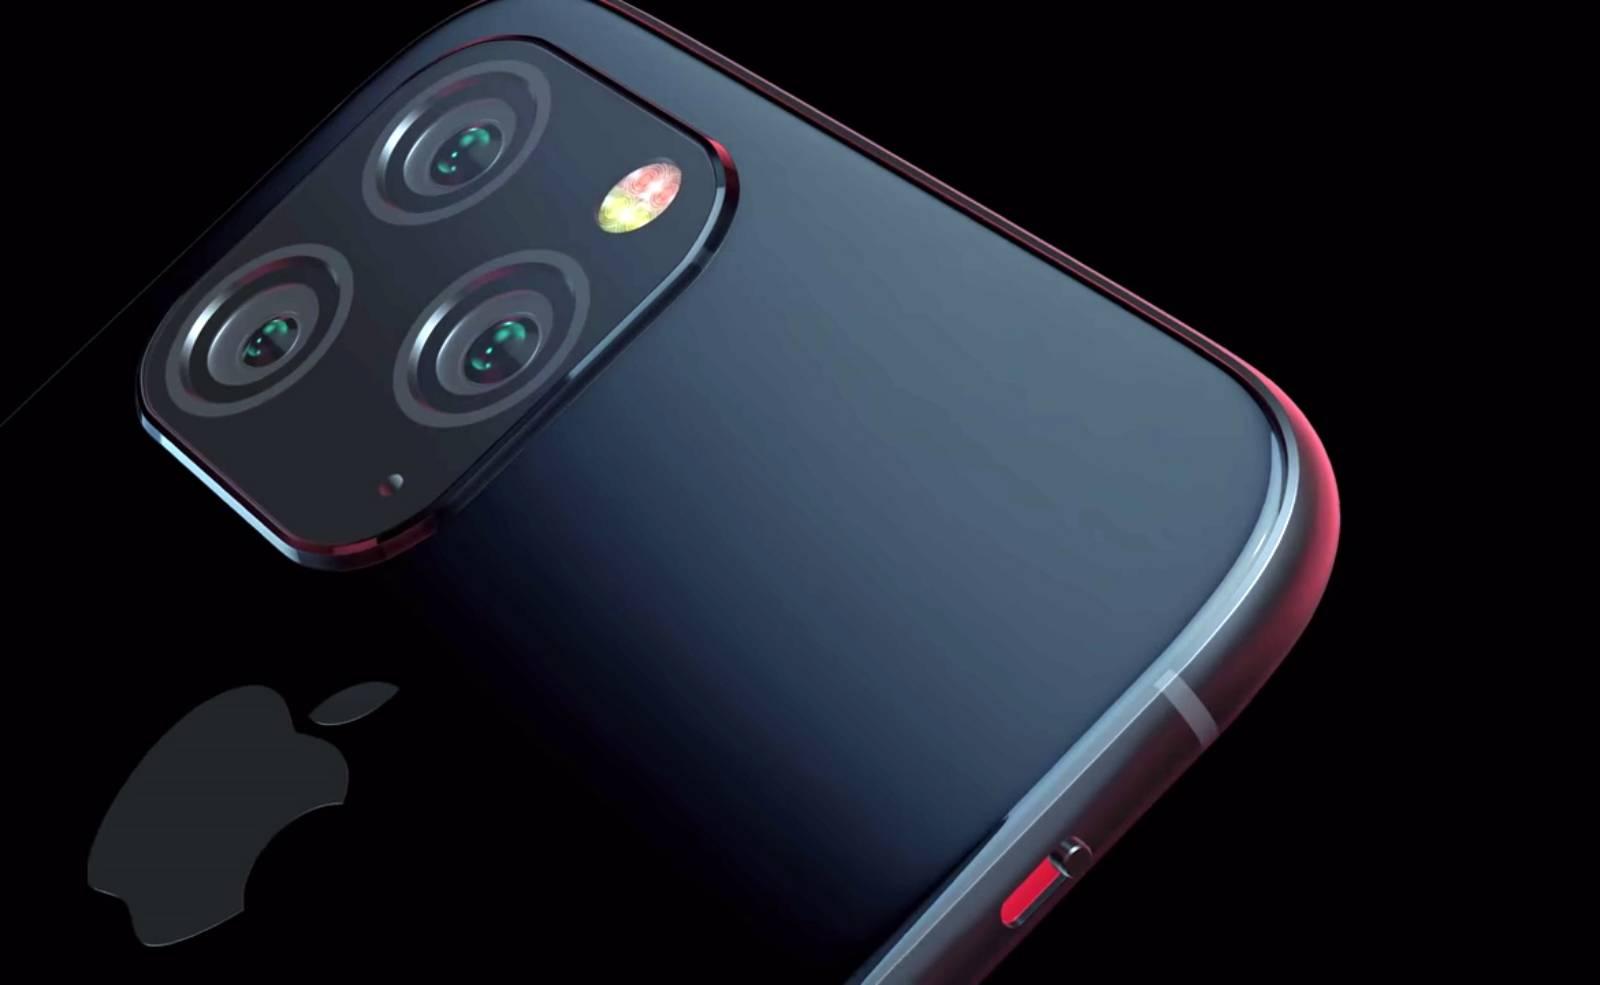 iPhone 11 arata astepti